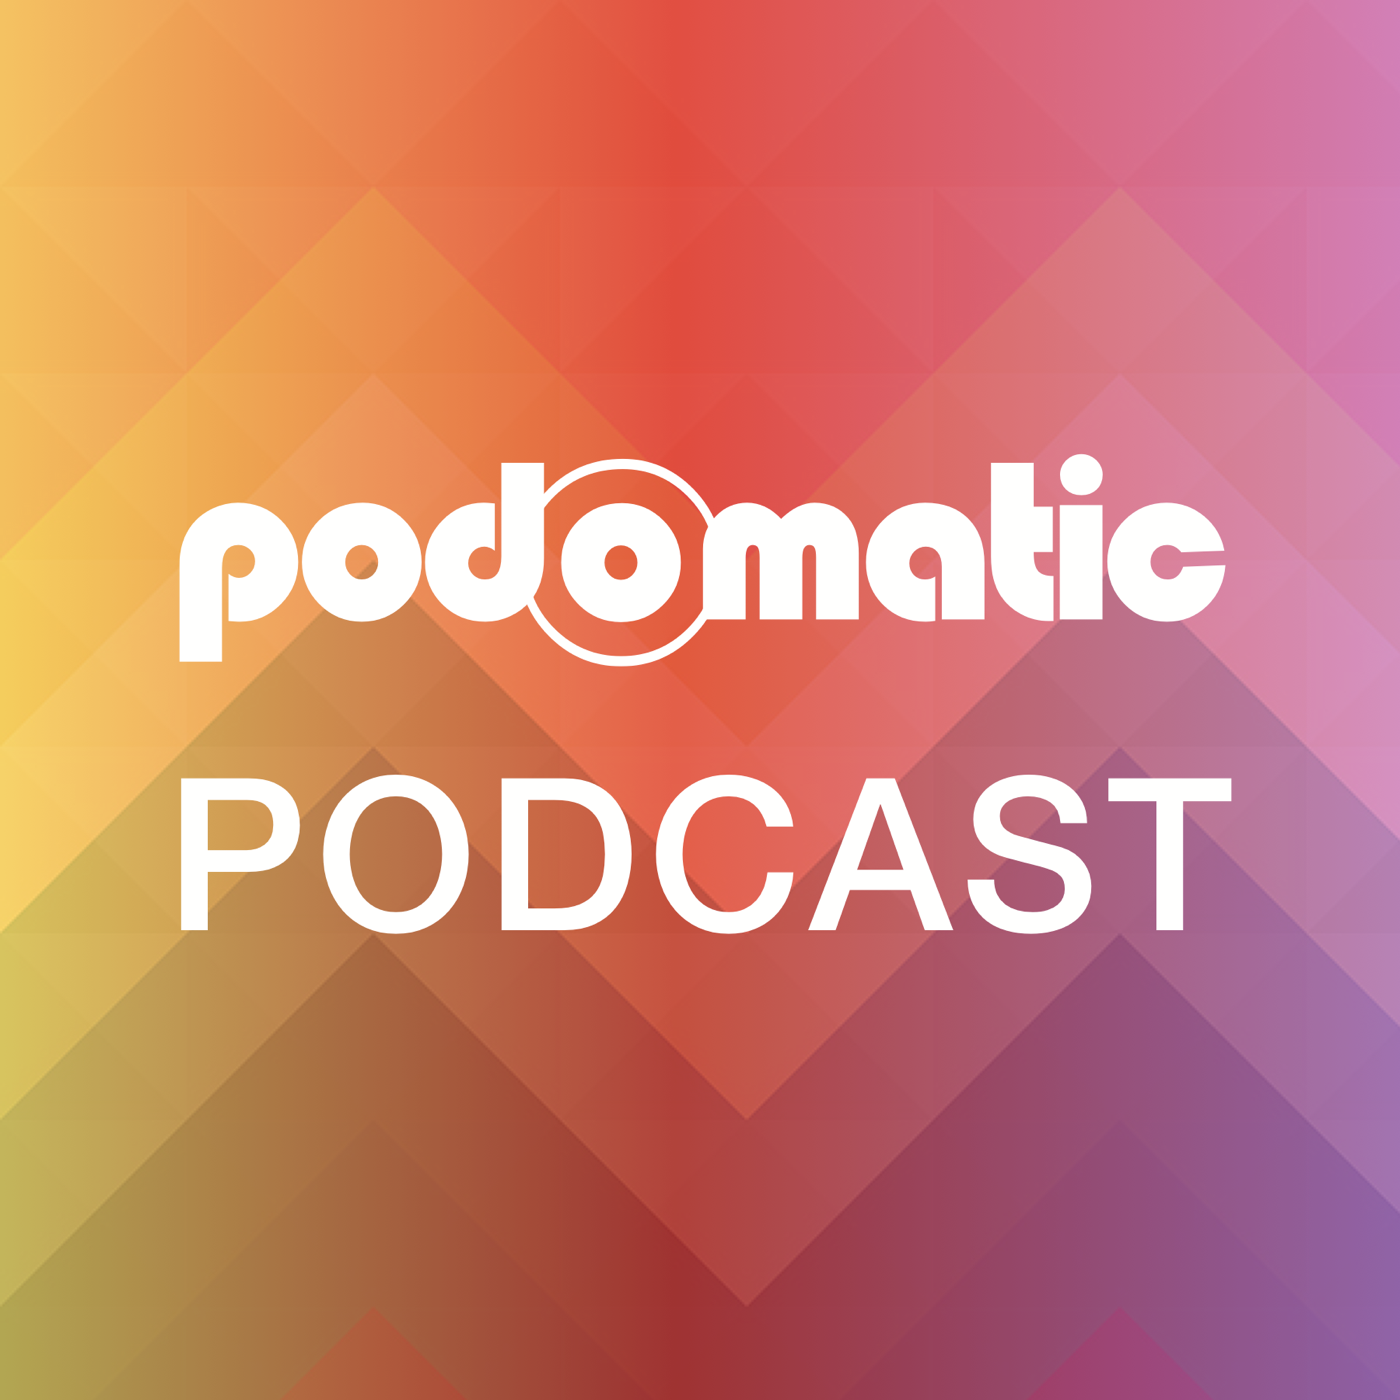 Håkan Nylander's Podcast